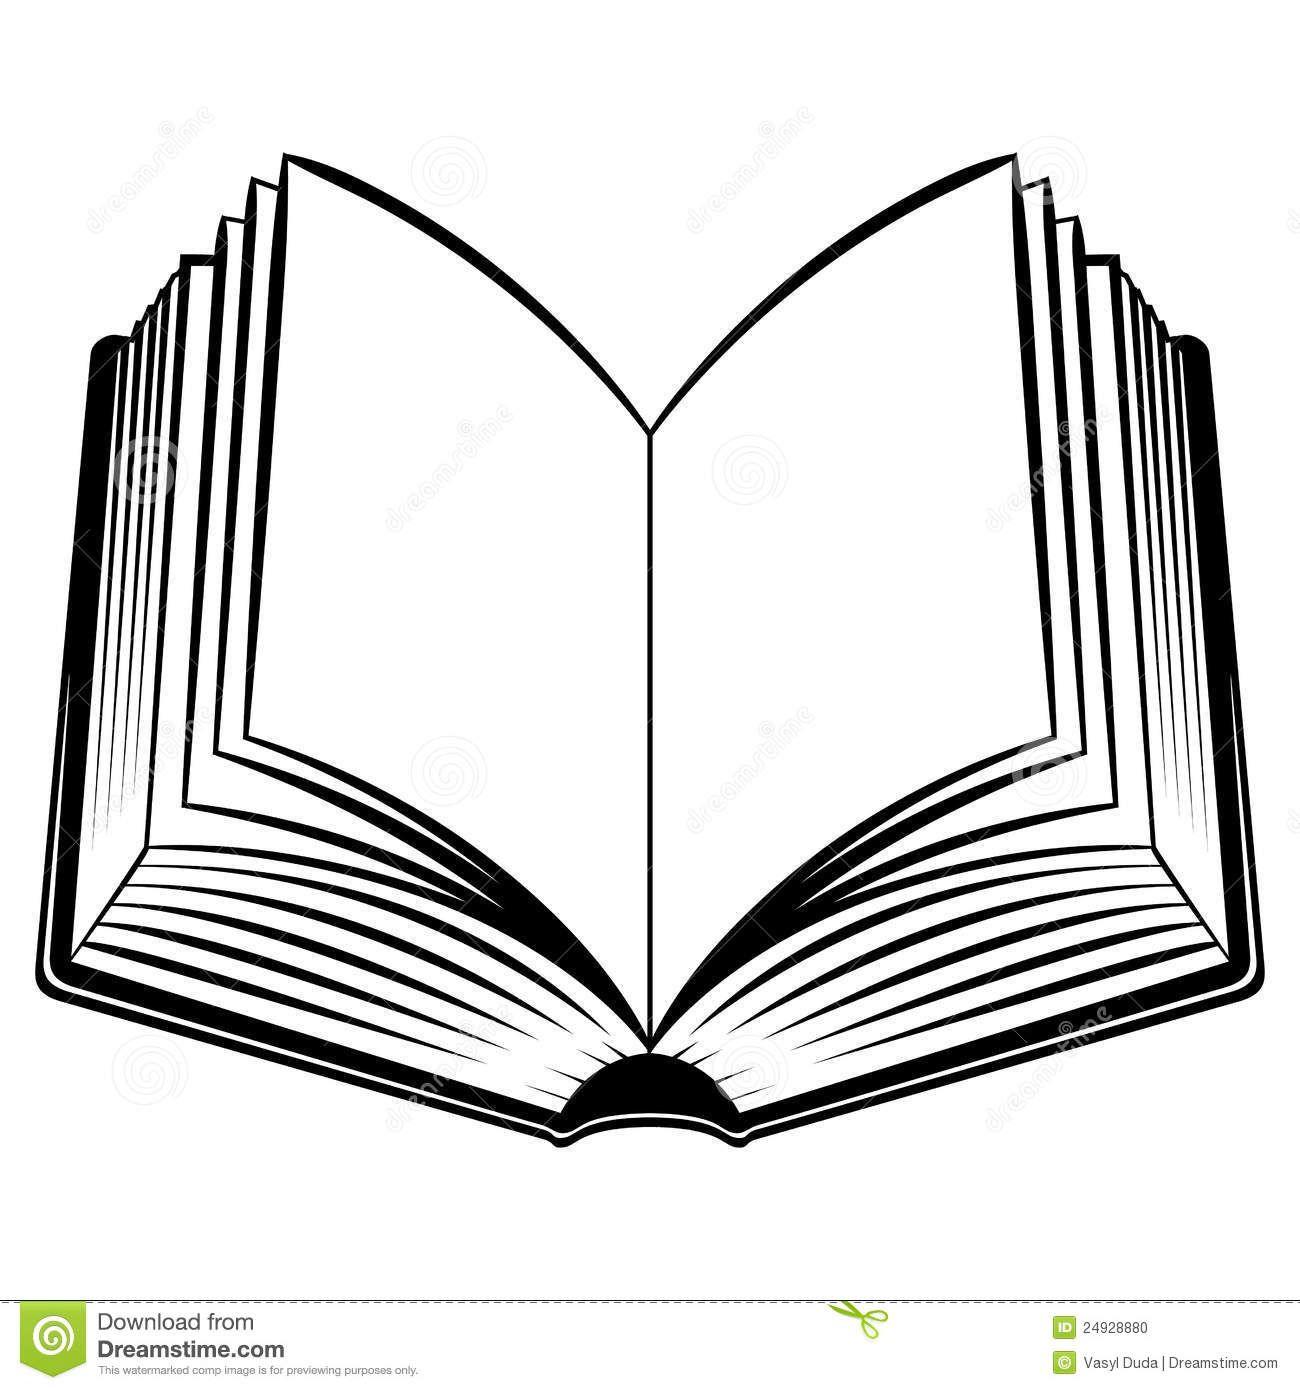 Image result for books outline.